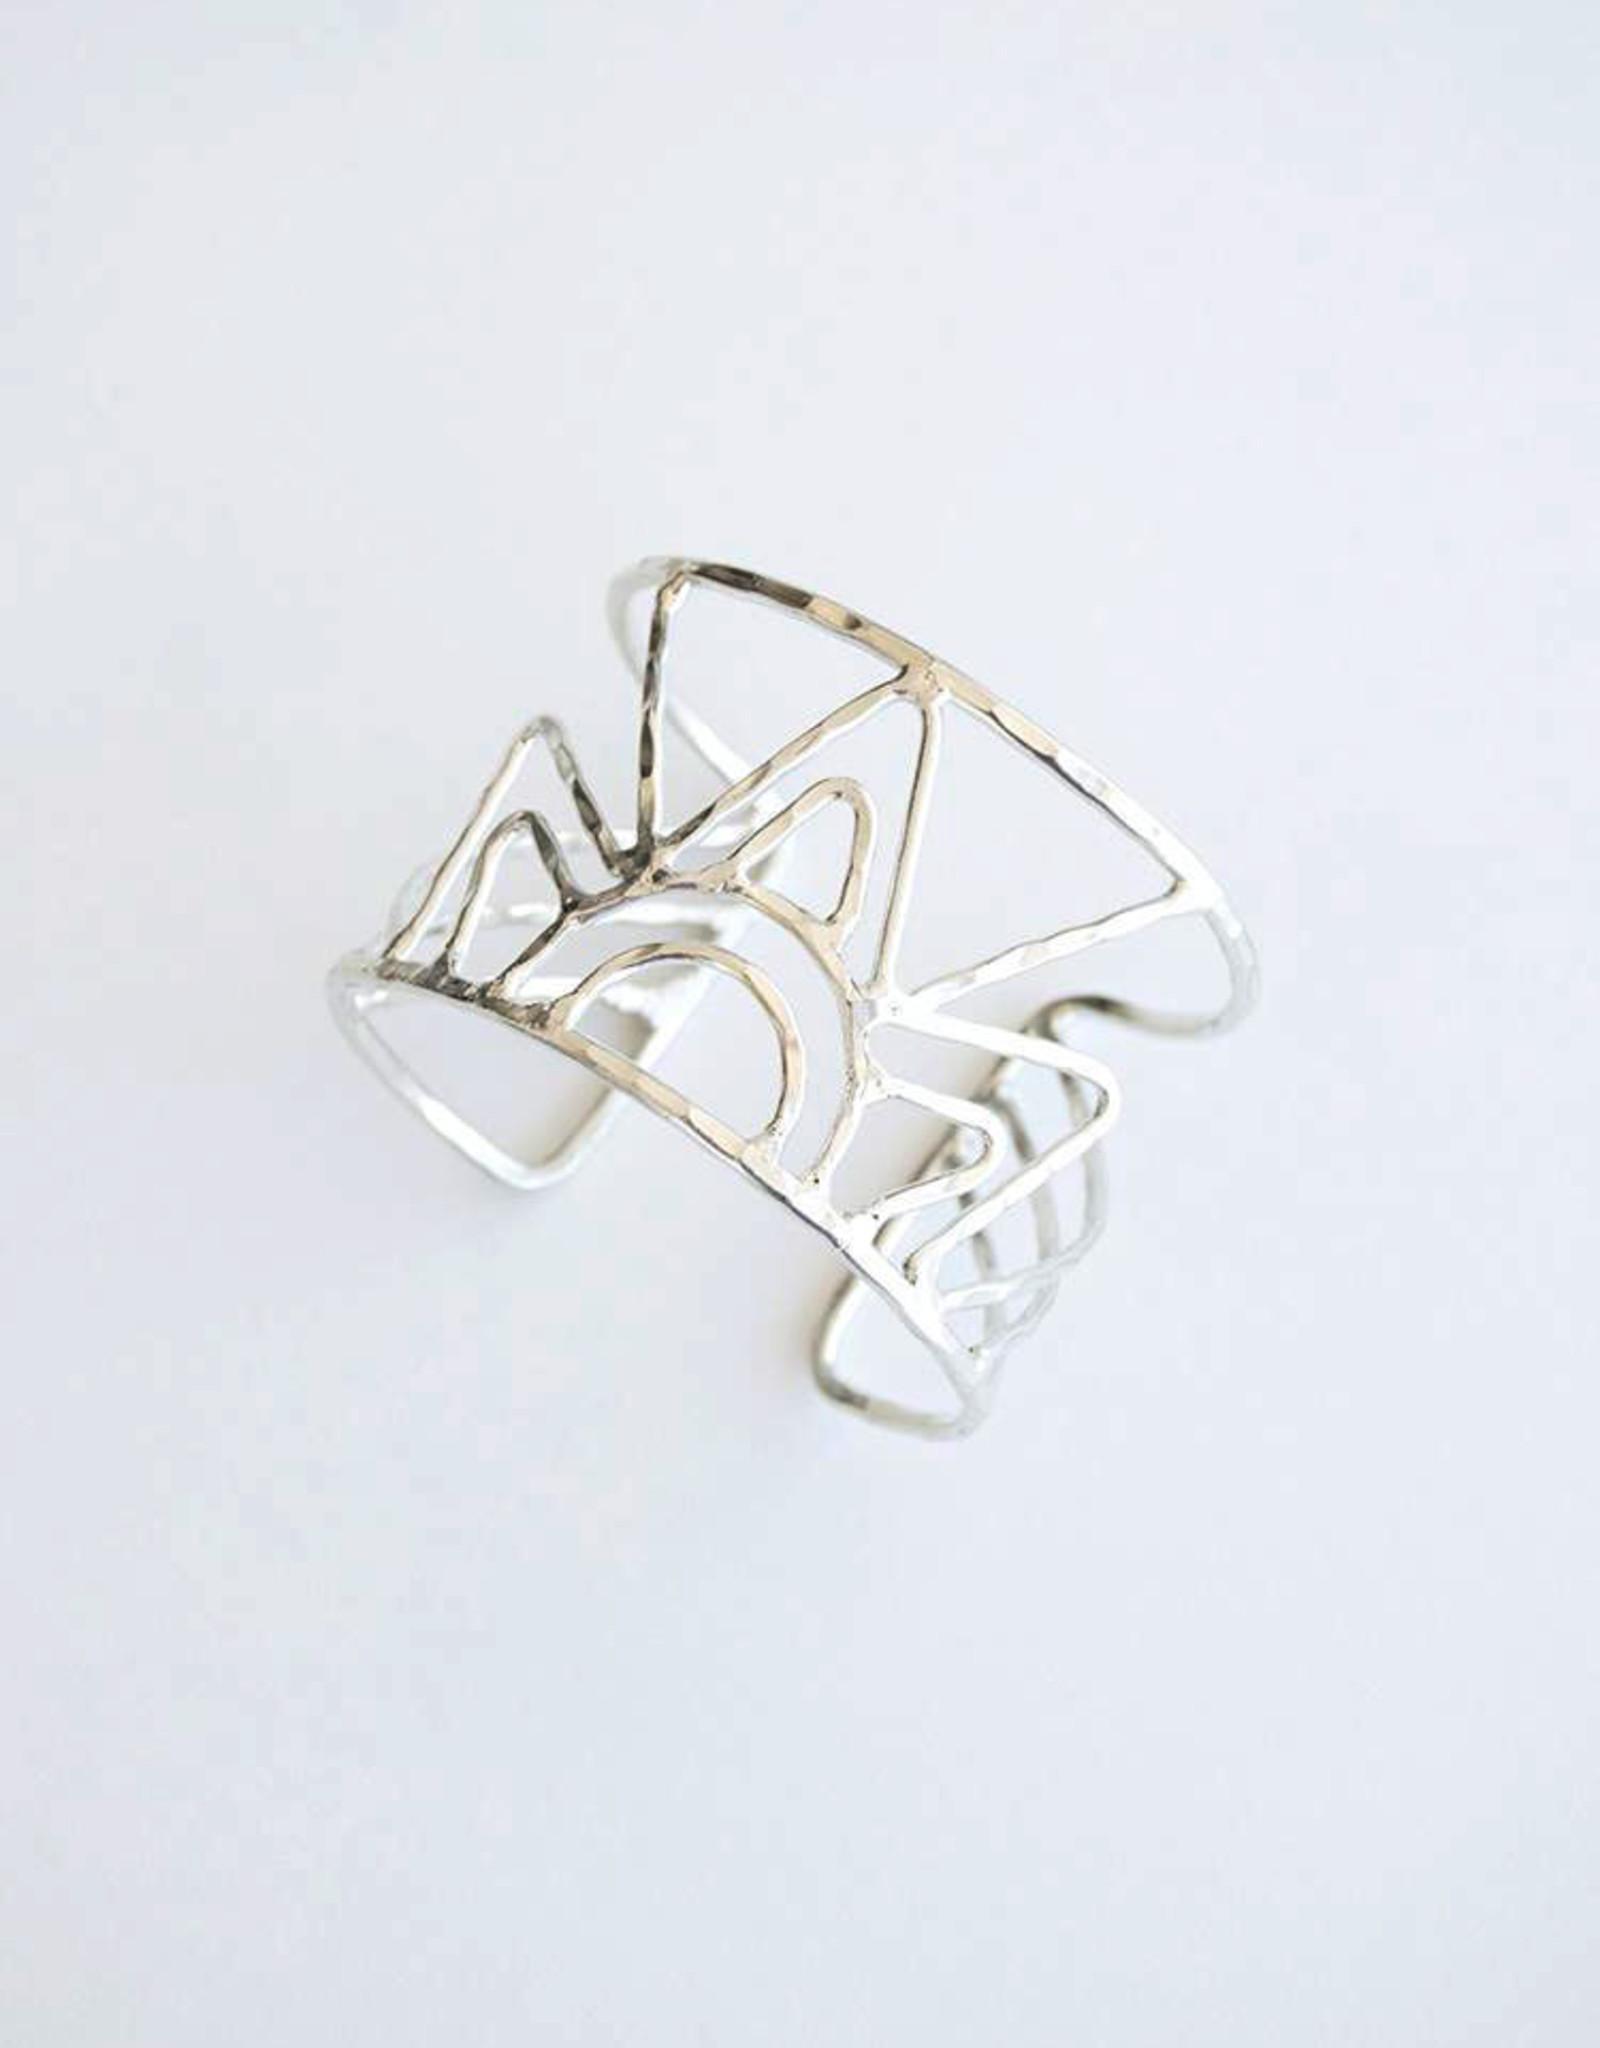 Mata Traders Deco Beam Cuff Bracelet, Silver - Mata Traders